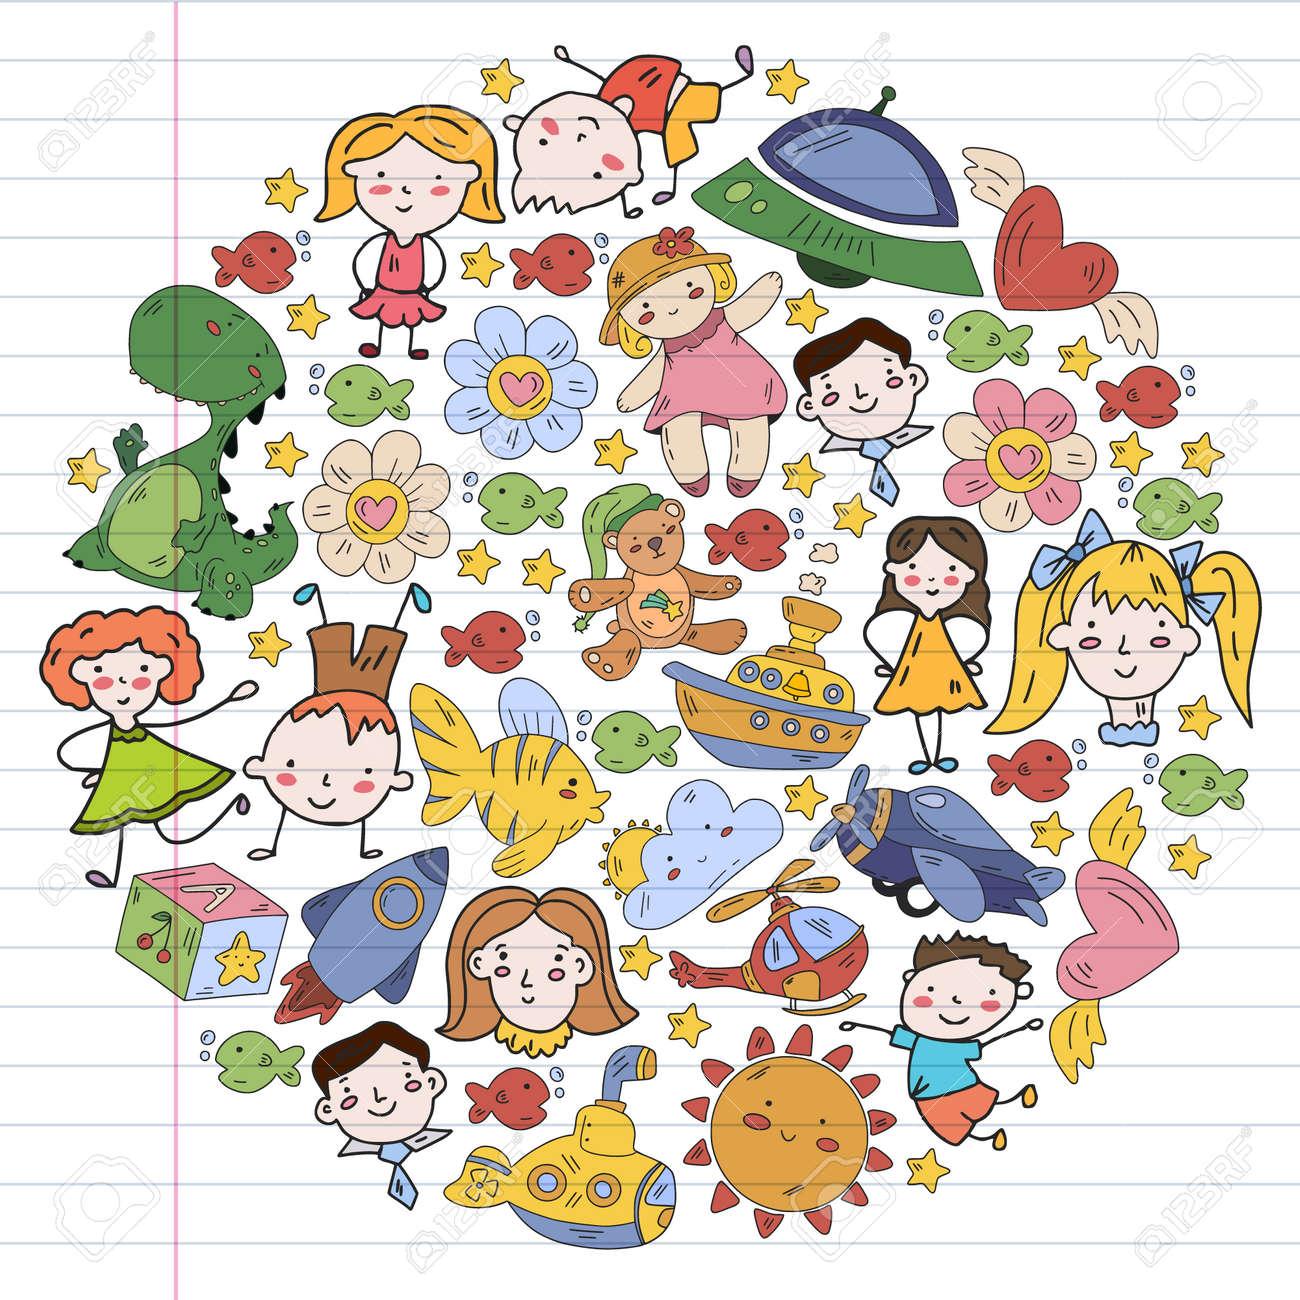 Children play with toys in the kindergarten. Kids playground. Education, creativity, imagination. - 173213226